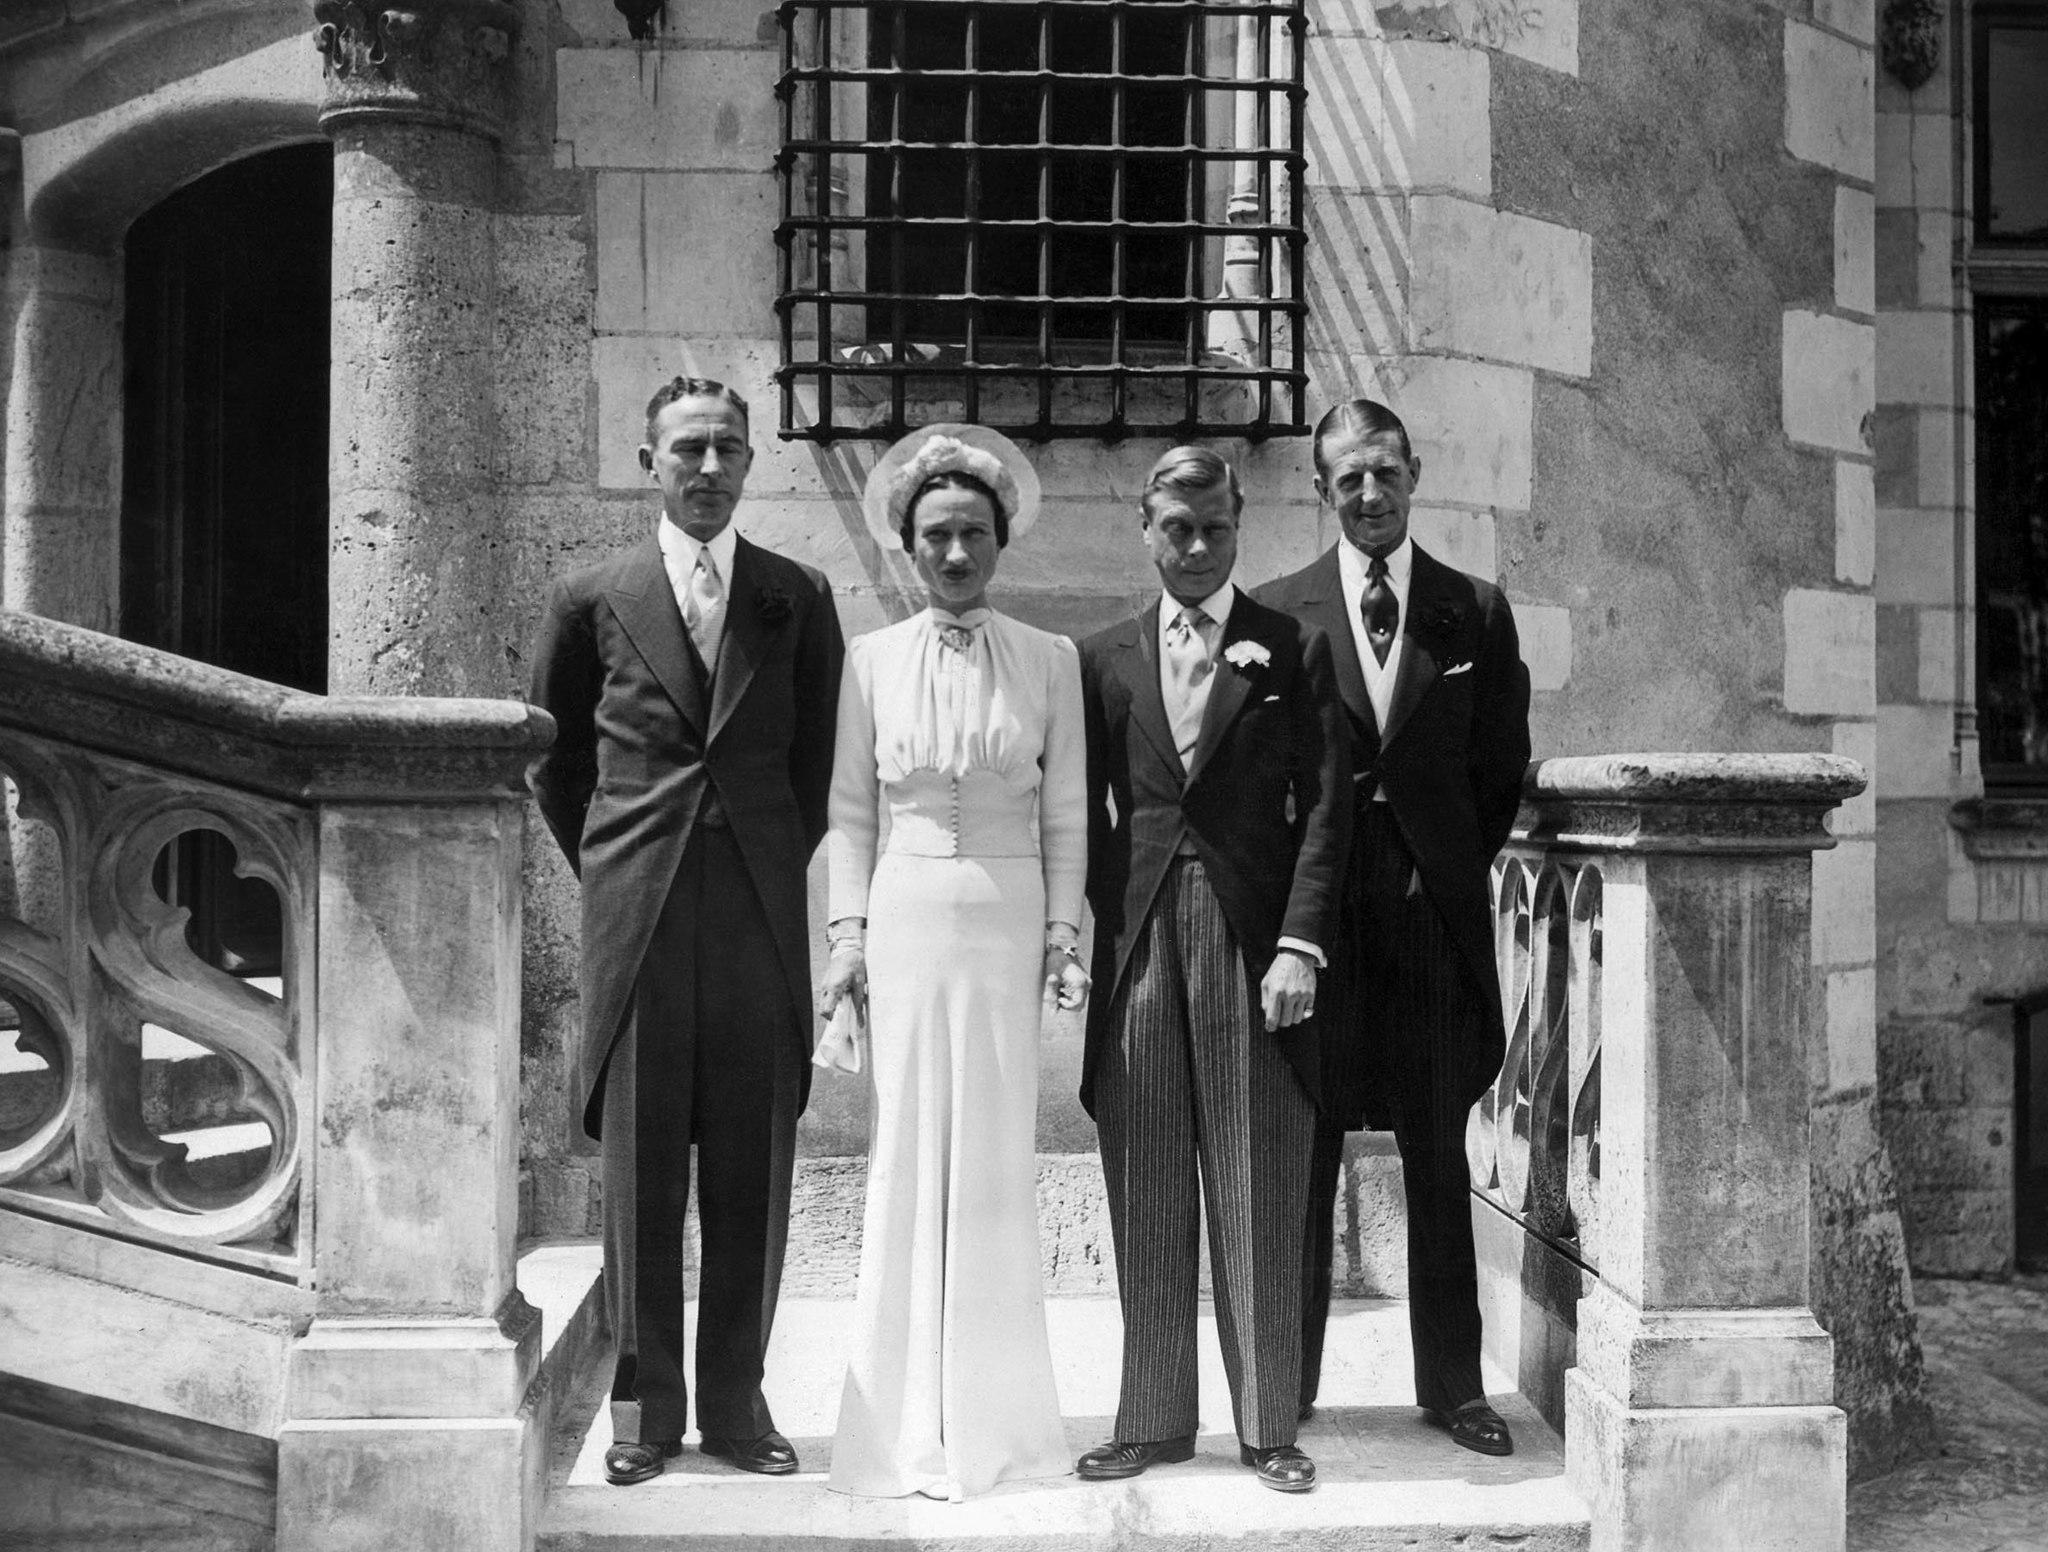 Prince Edward, Wallis Simpson